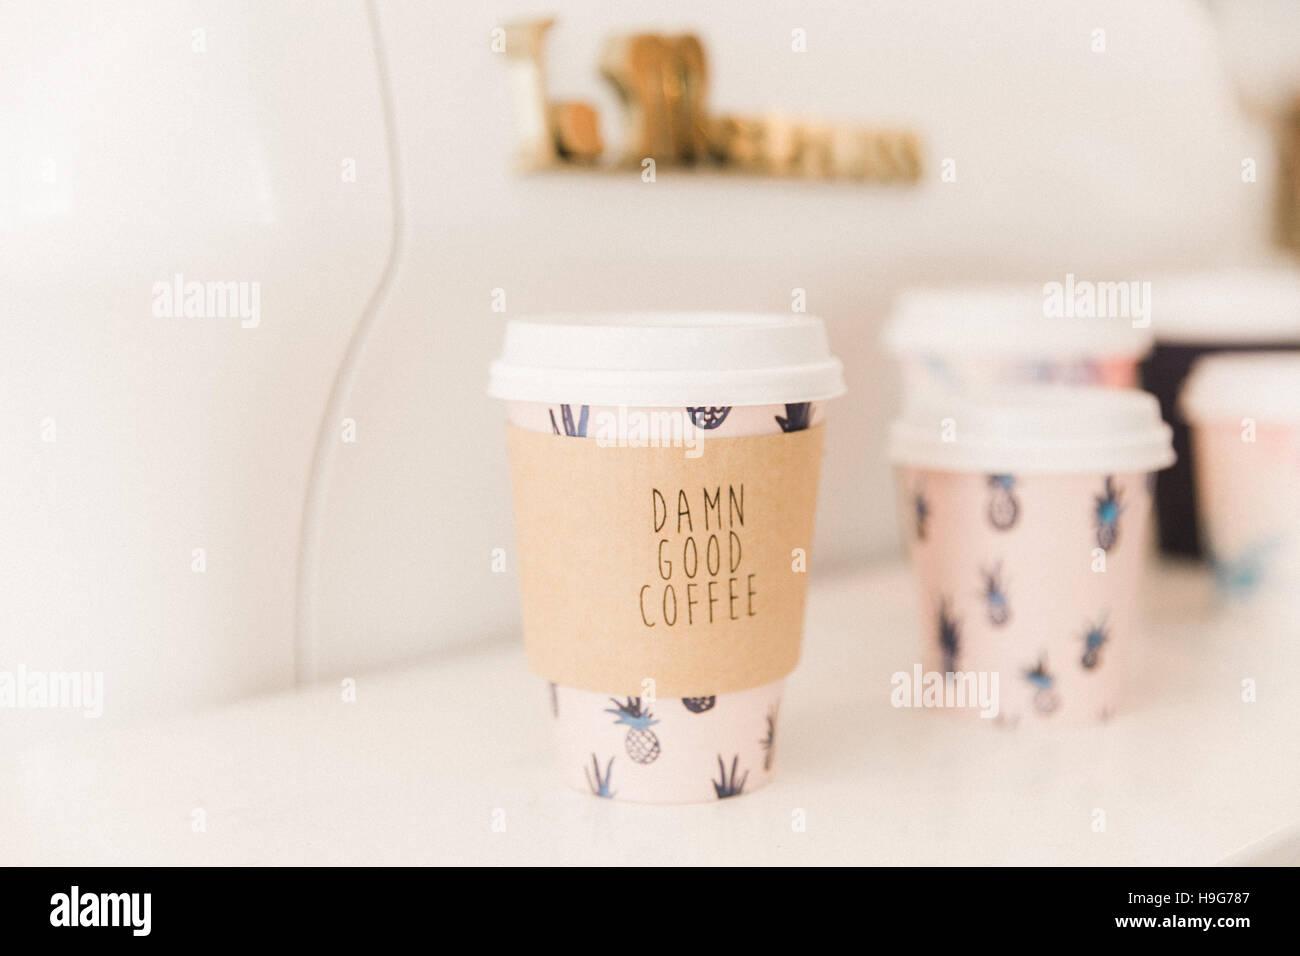 Damn good coffee - Stock Image